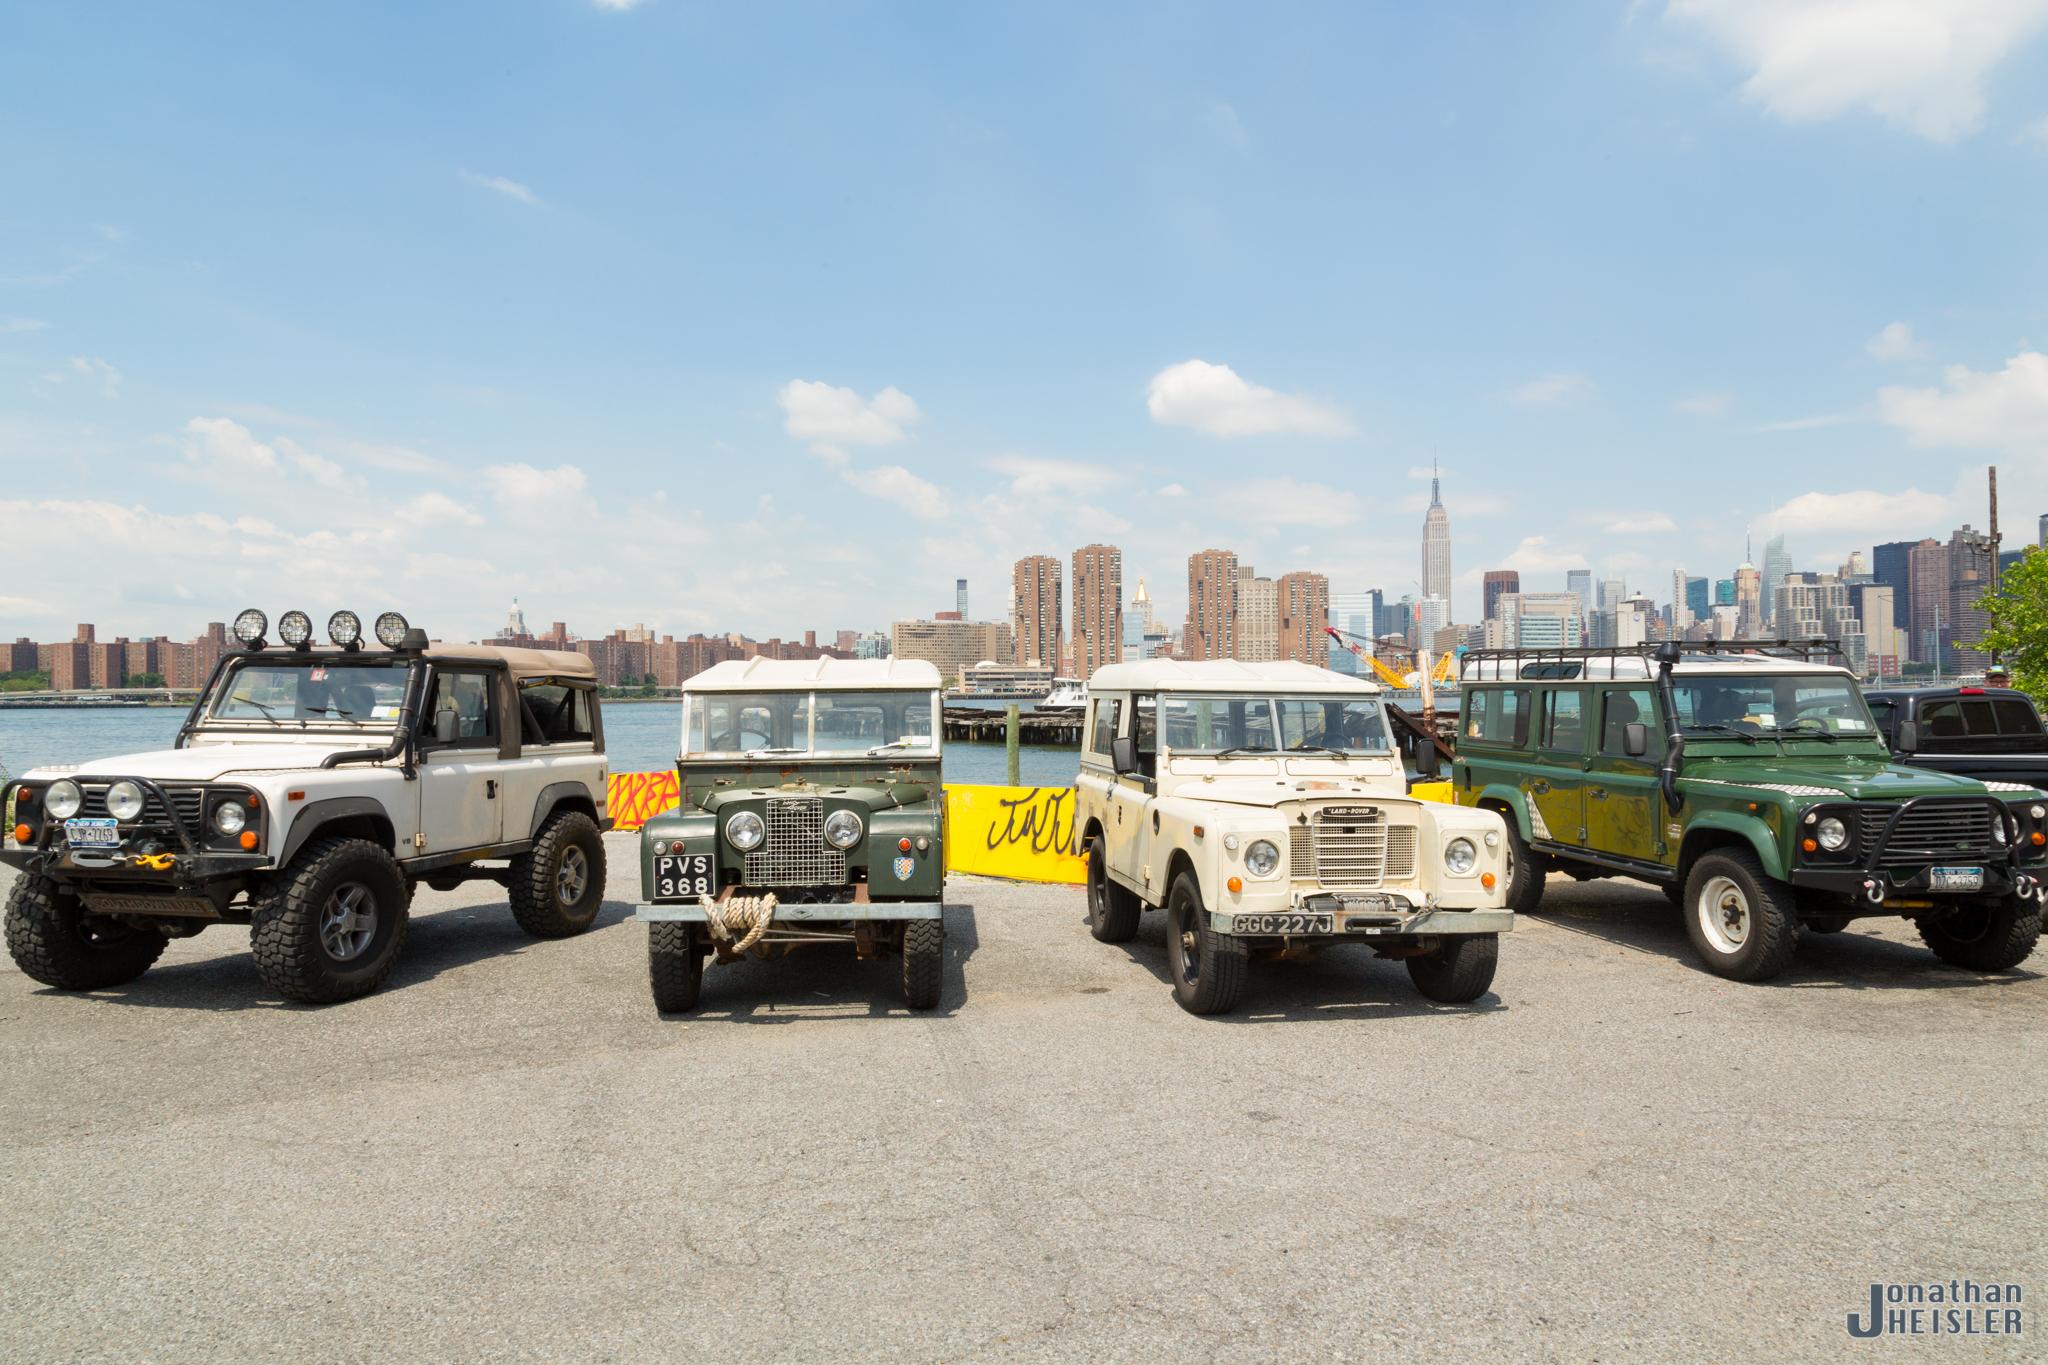 6-22-2014 _ Land Rover Defender  _  New York City00035.jpg